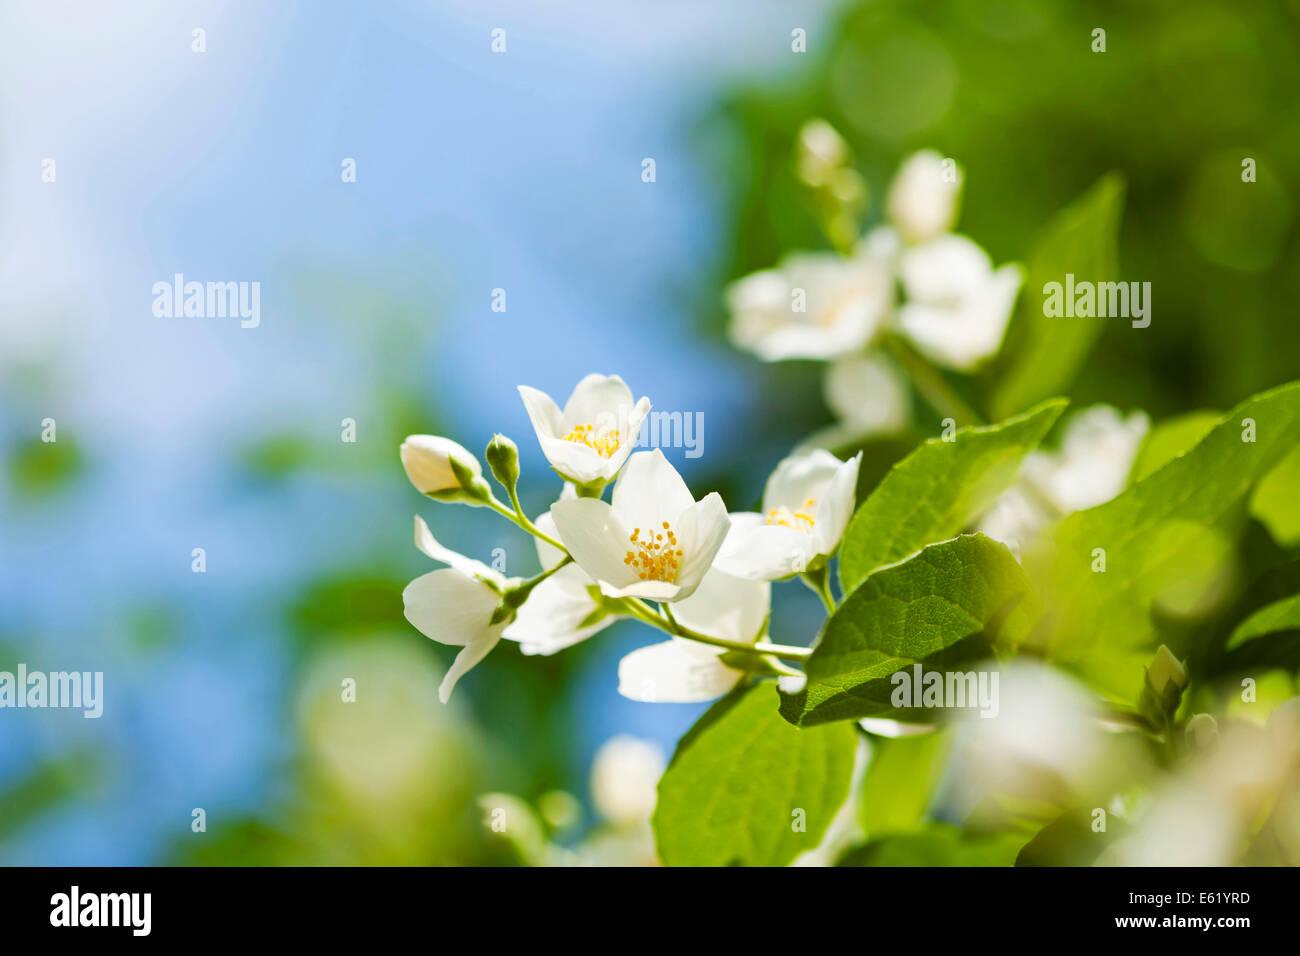 Beautiful Fresh Jasmine Flowers In The Garden, Macro Photography